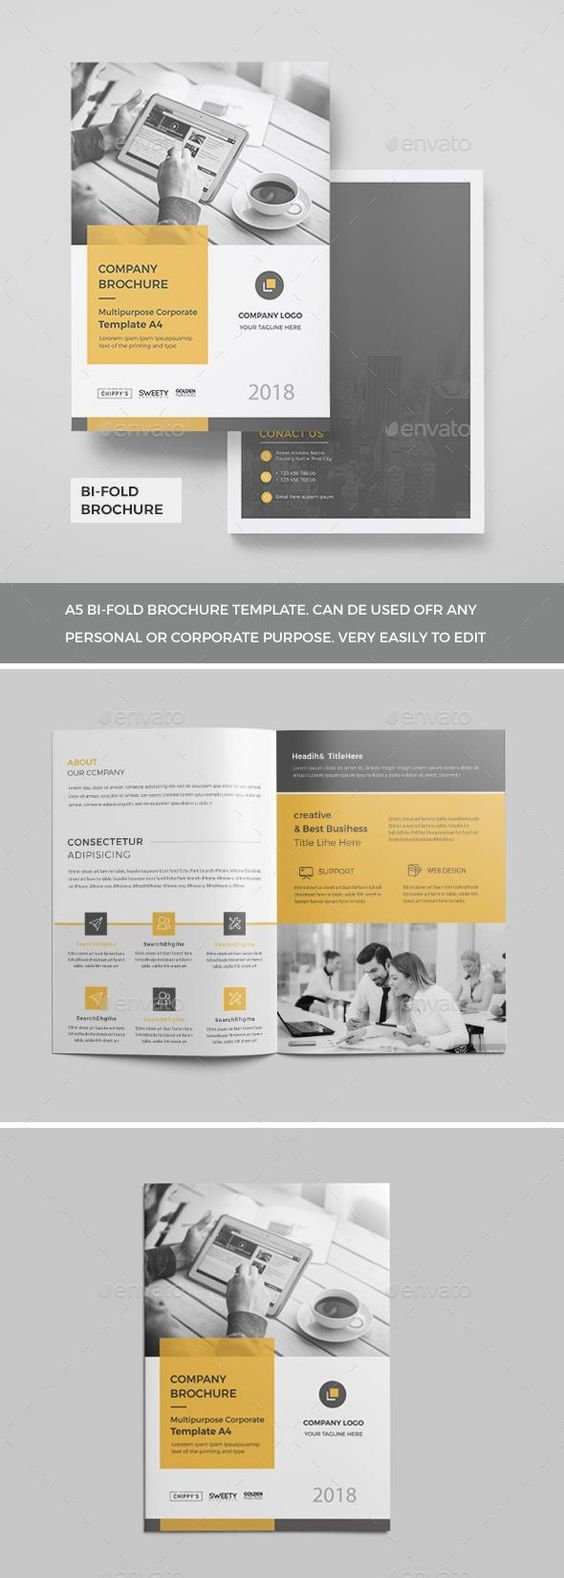 Corporate Bi Fold Brochure 2018 Bi Fold Brochure Brochure Template Graphic Design Brochure Bi fold brochure template free